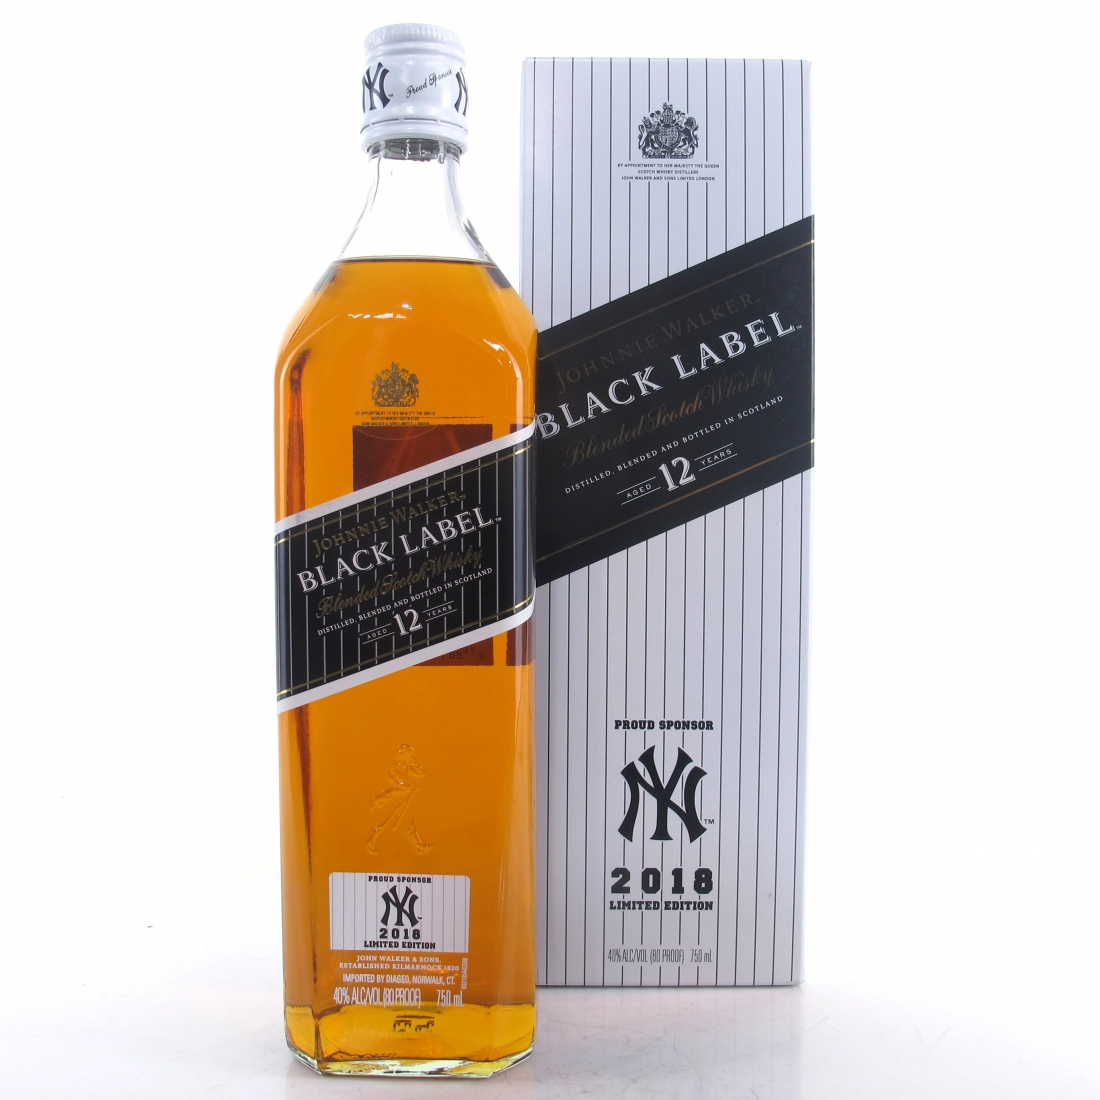 Johnnie Walker Black Label 12 Year Old 75cl / New York Yankees 2018